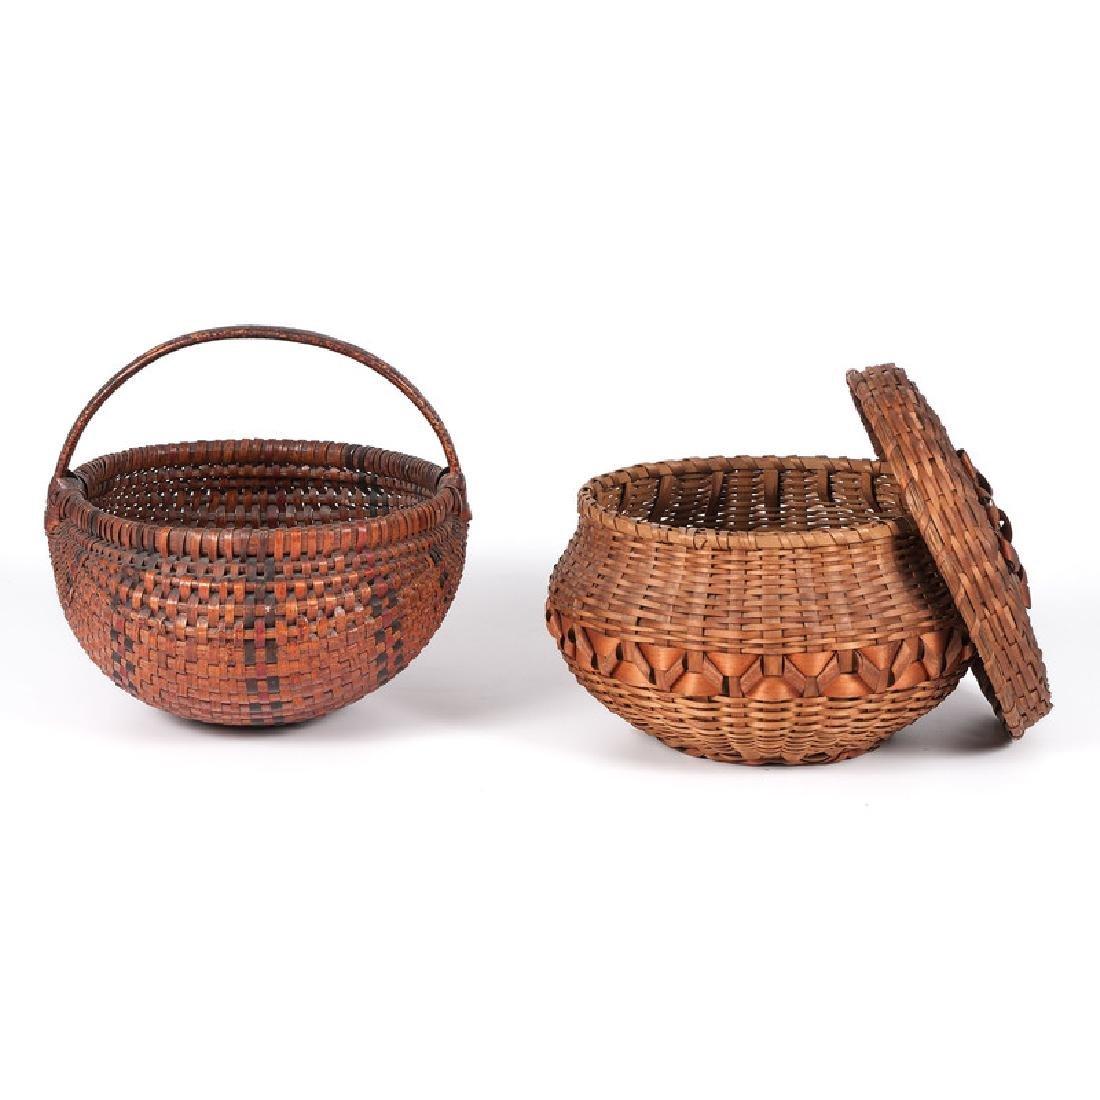 Woven Baskets - 2